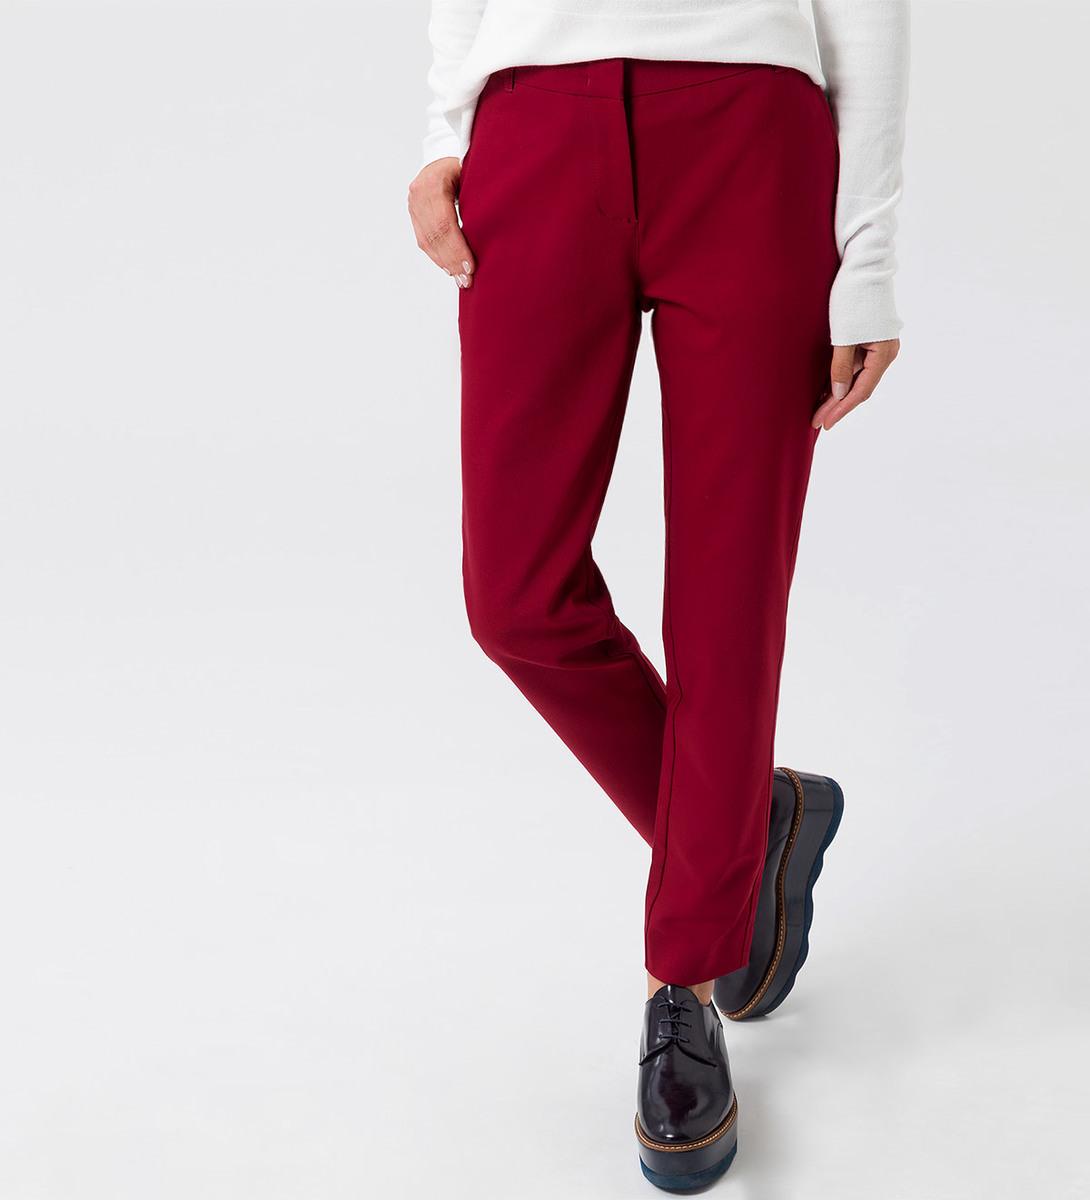 Hose im unifarbenen Design in wine red